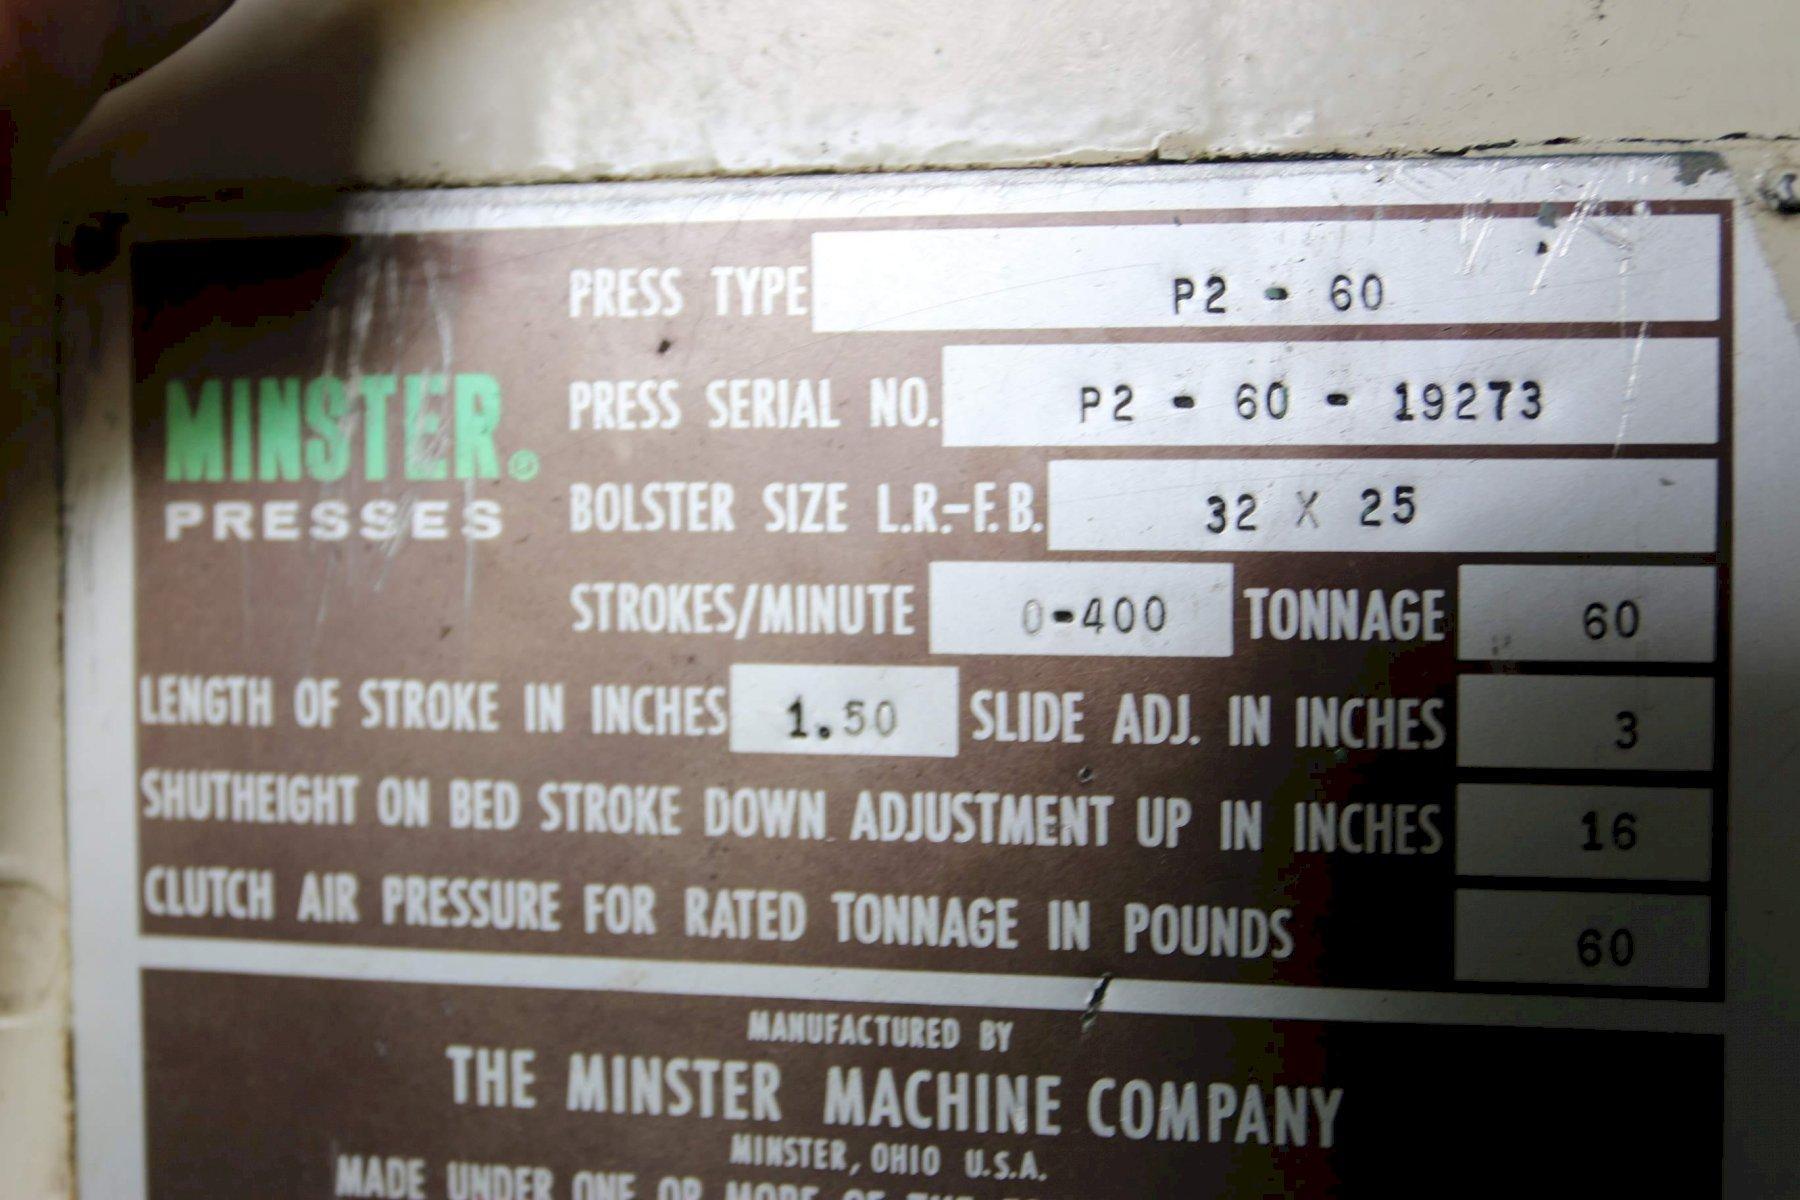 60 TON MINSTER MODEL #P2-60-32 PIECE MAKER SSDC PRESS: STOCK 68274